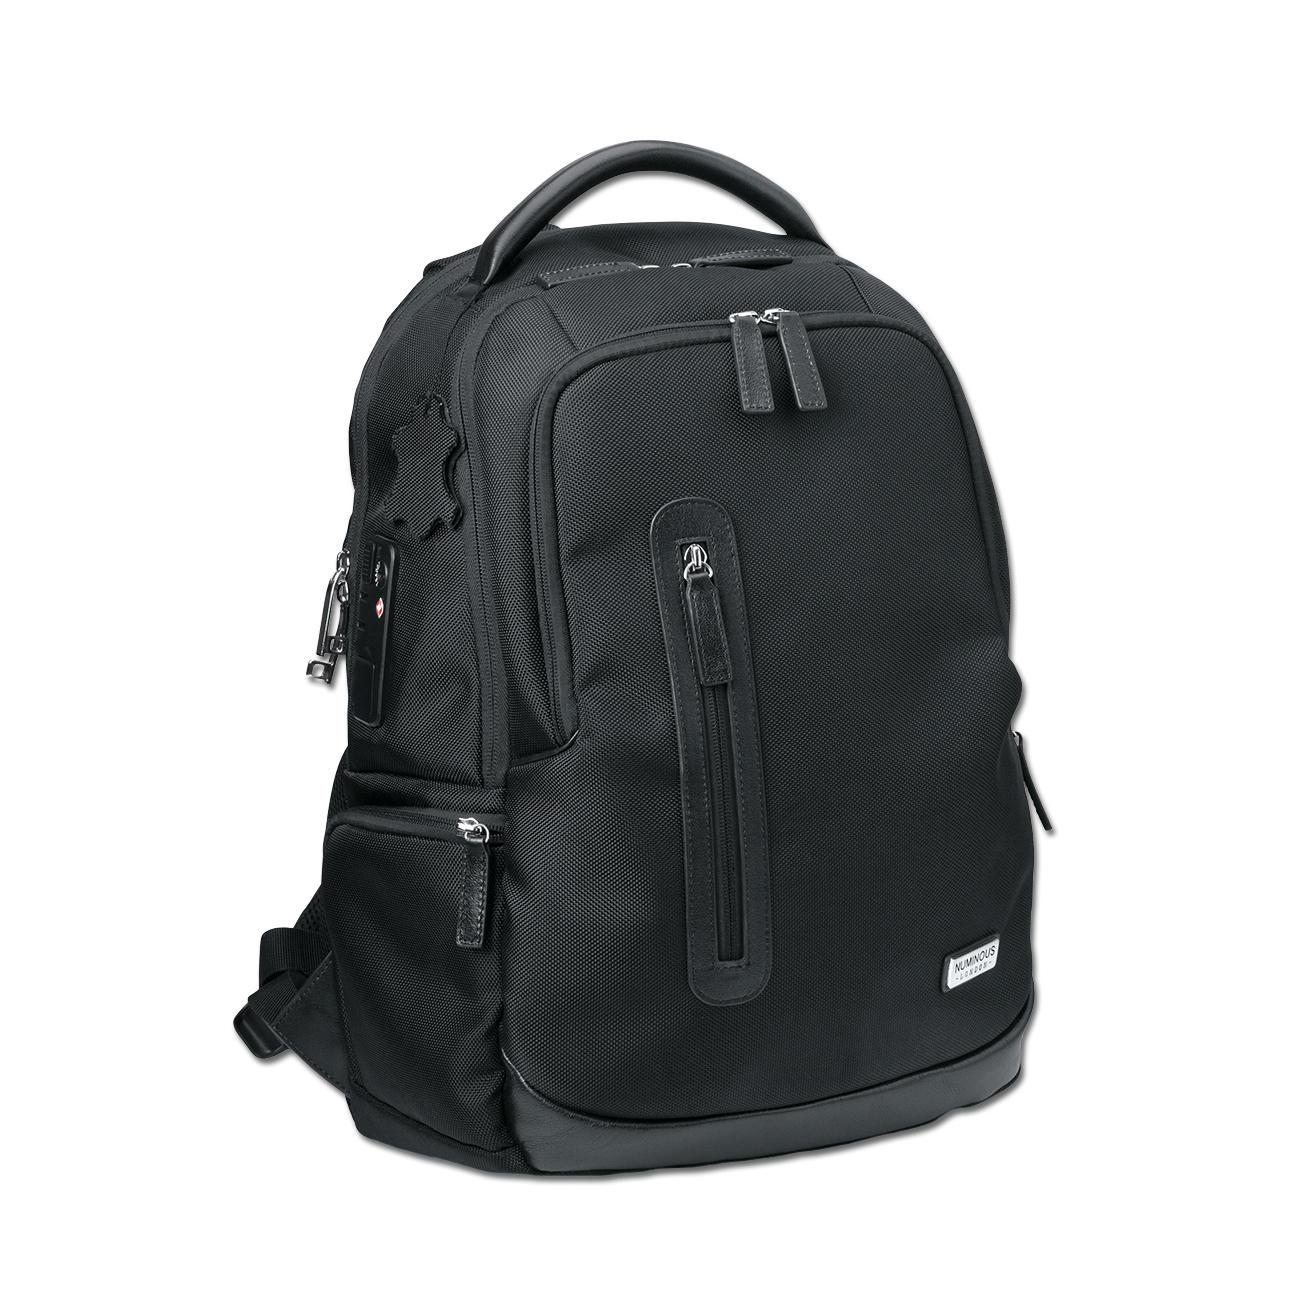 numinous london smart city backpack 901 rucksack mit fingerprint schloss. Black Bedroom Furniture Sets. Home Design Ideas